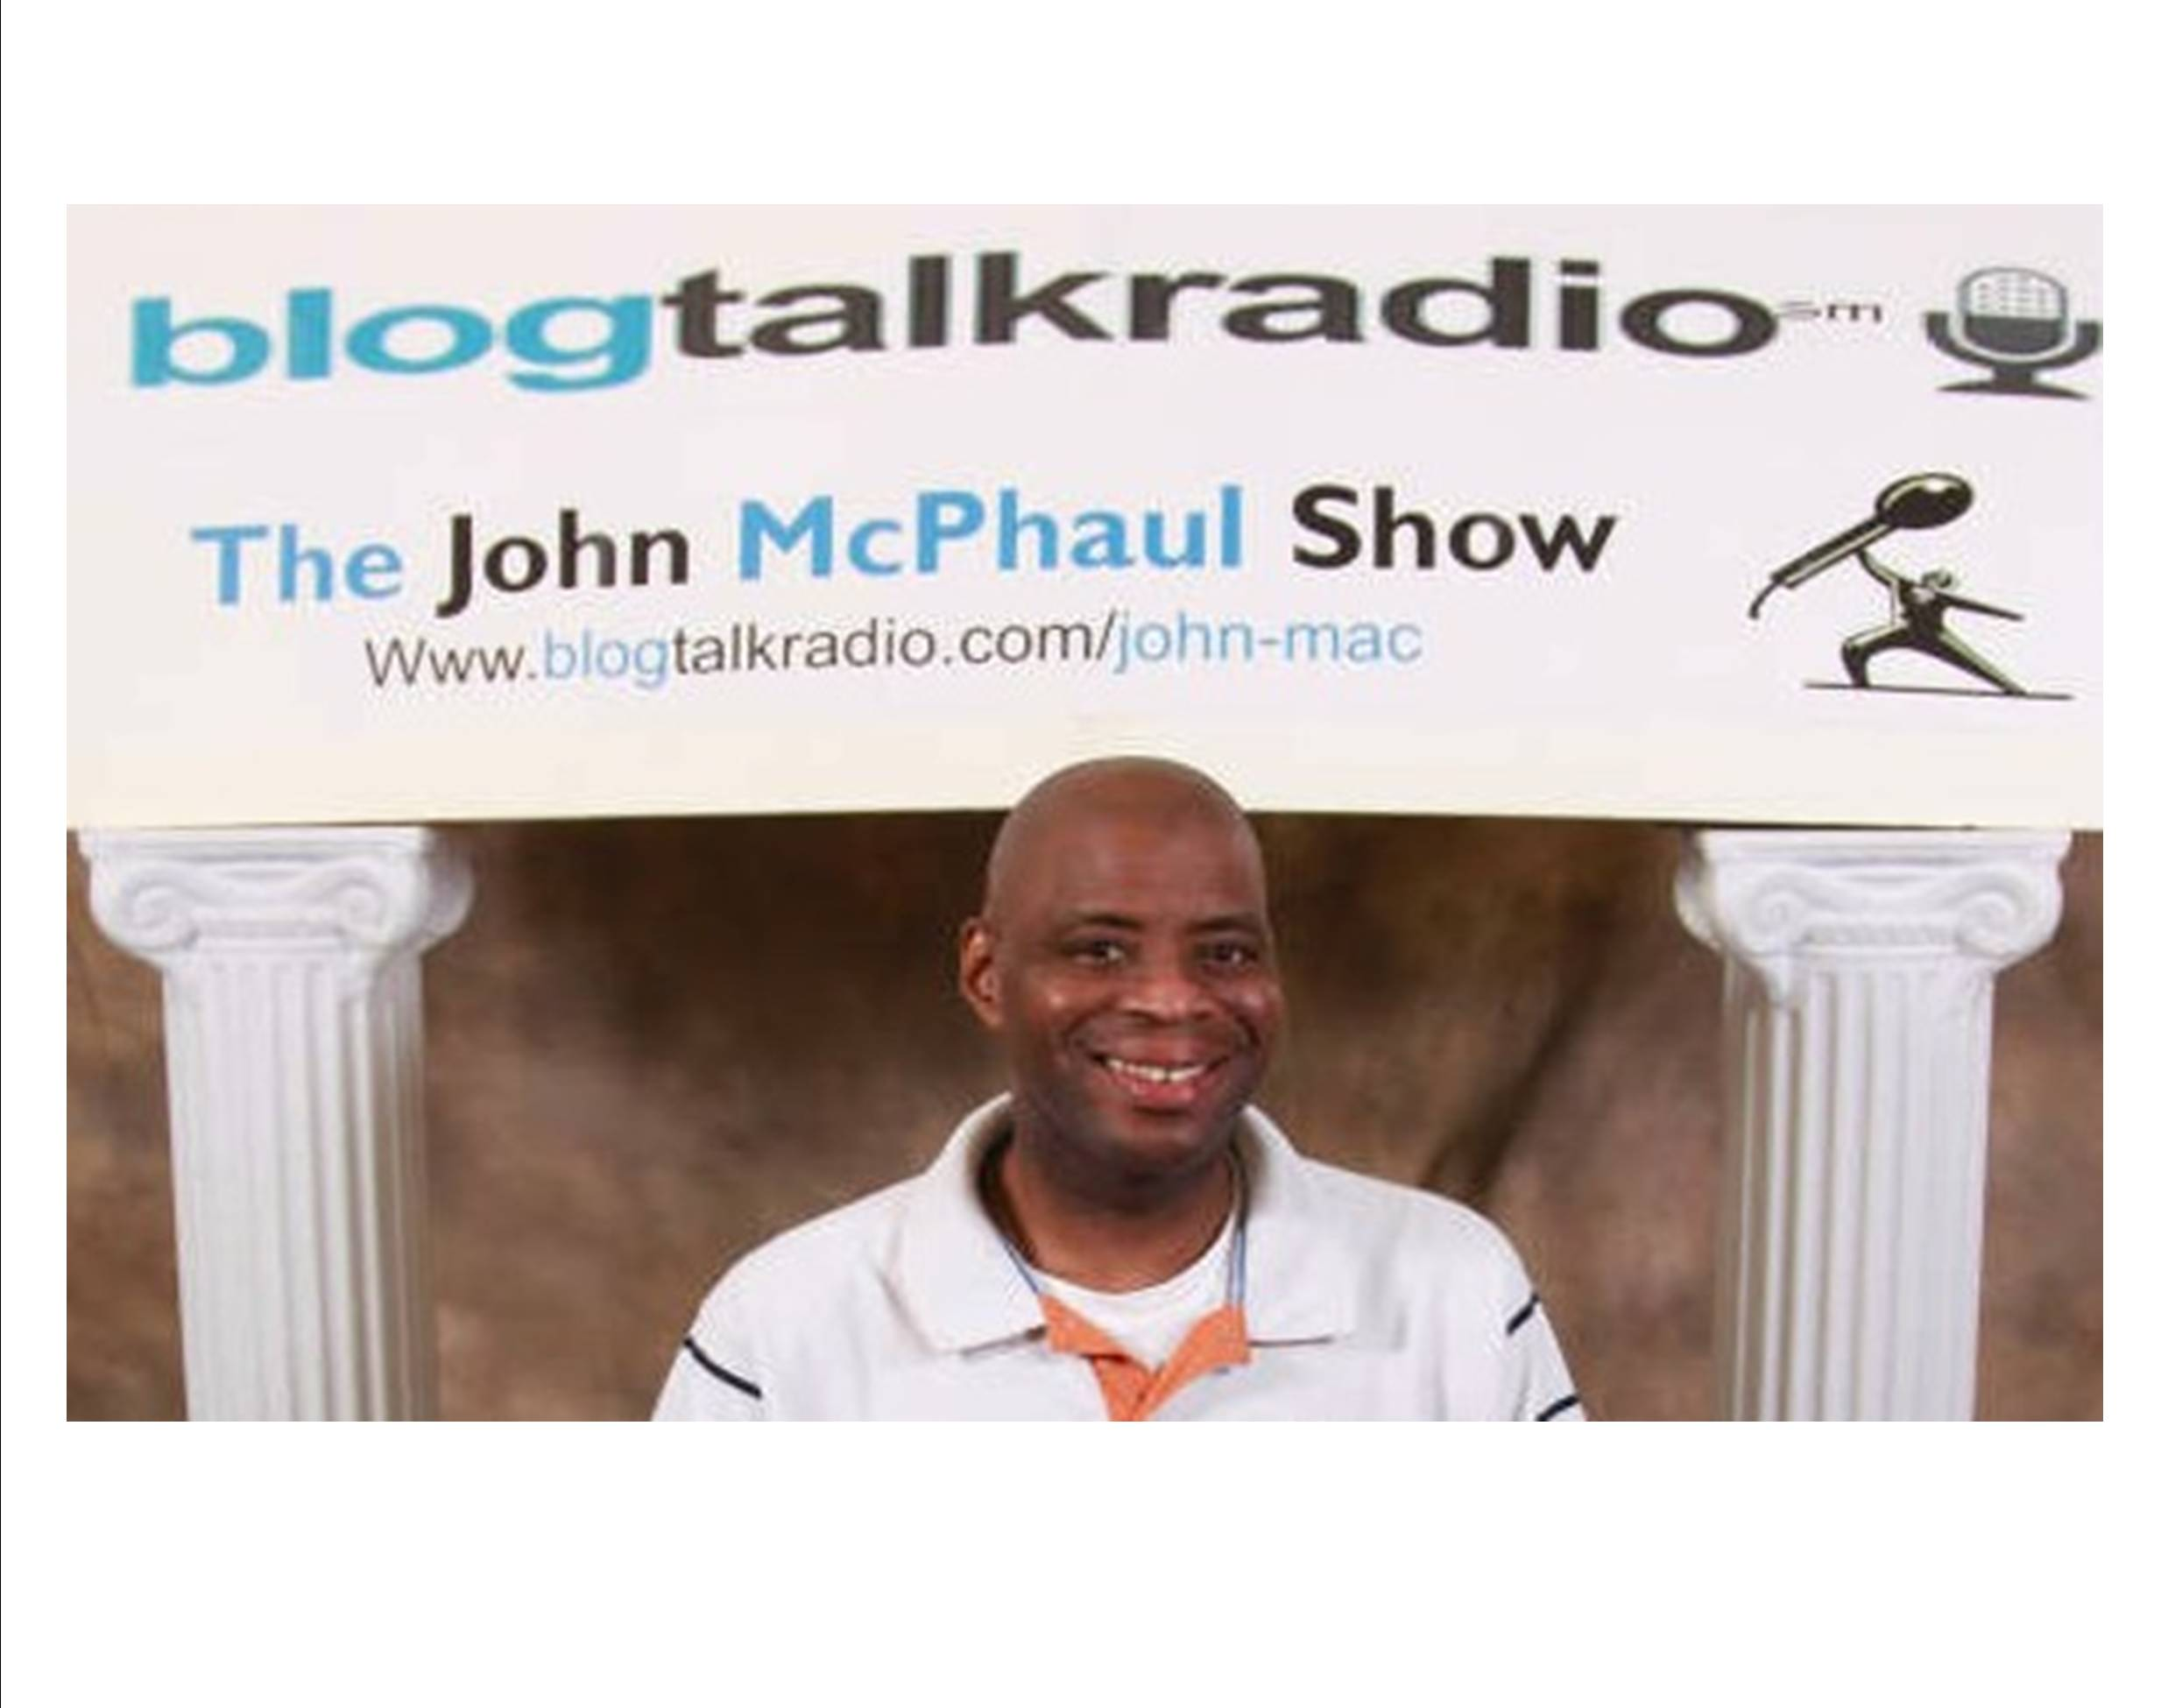 John McPhaul Show